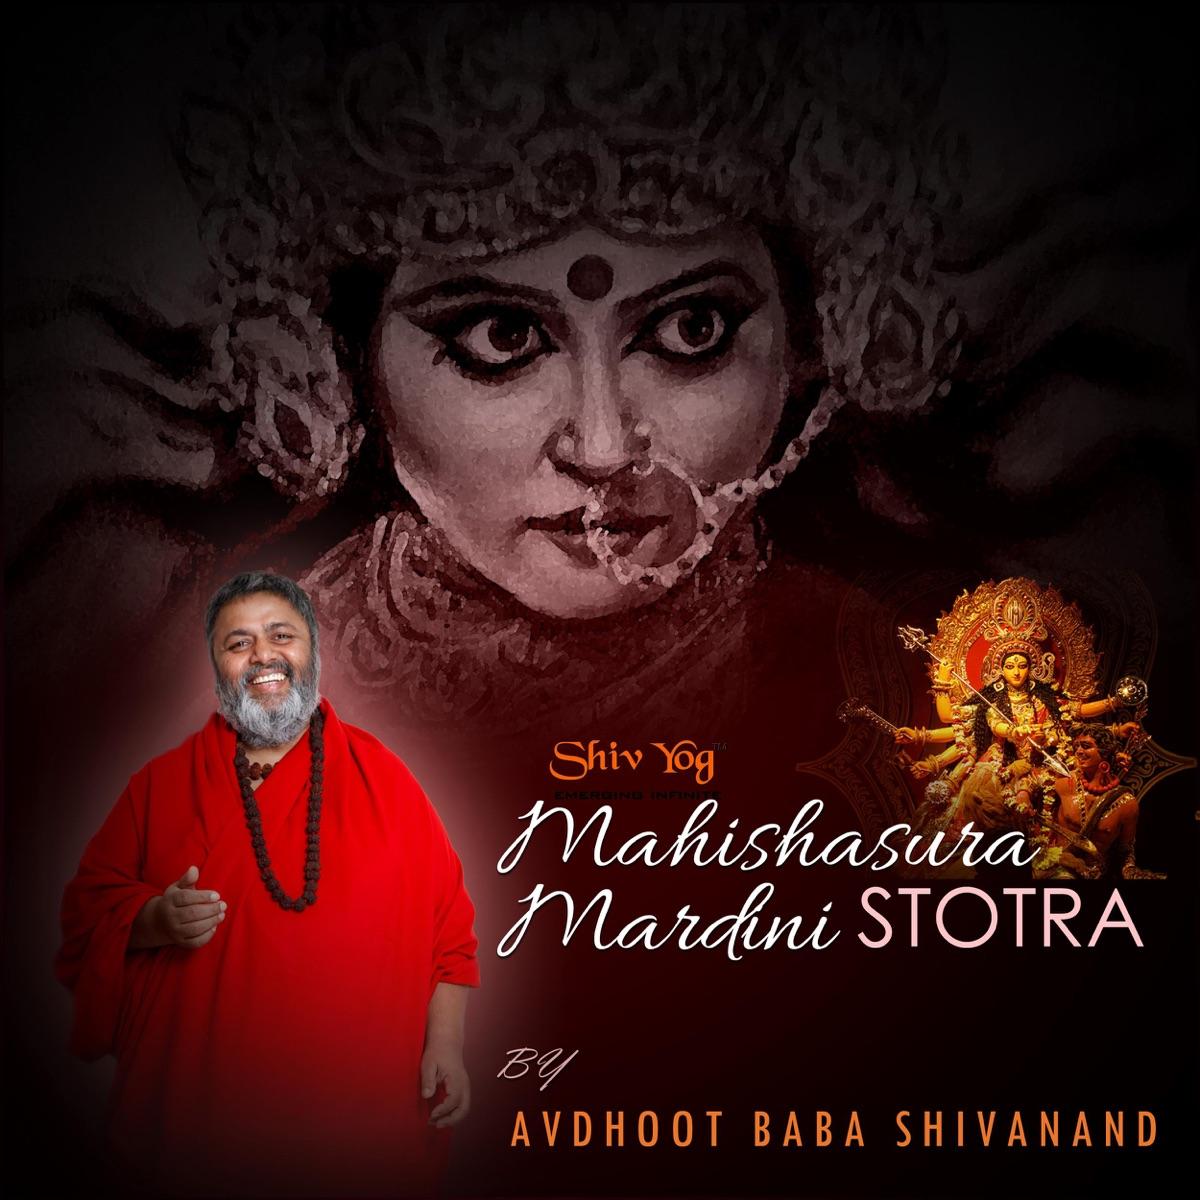 ShivYog Chants Mahishasura Mardini Stotra Album Cover by